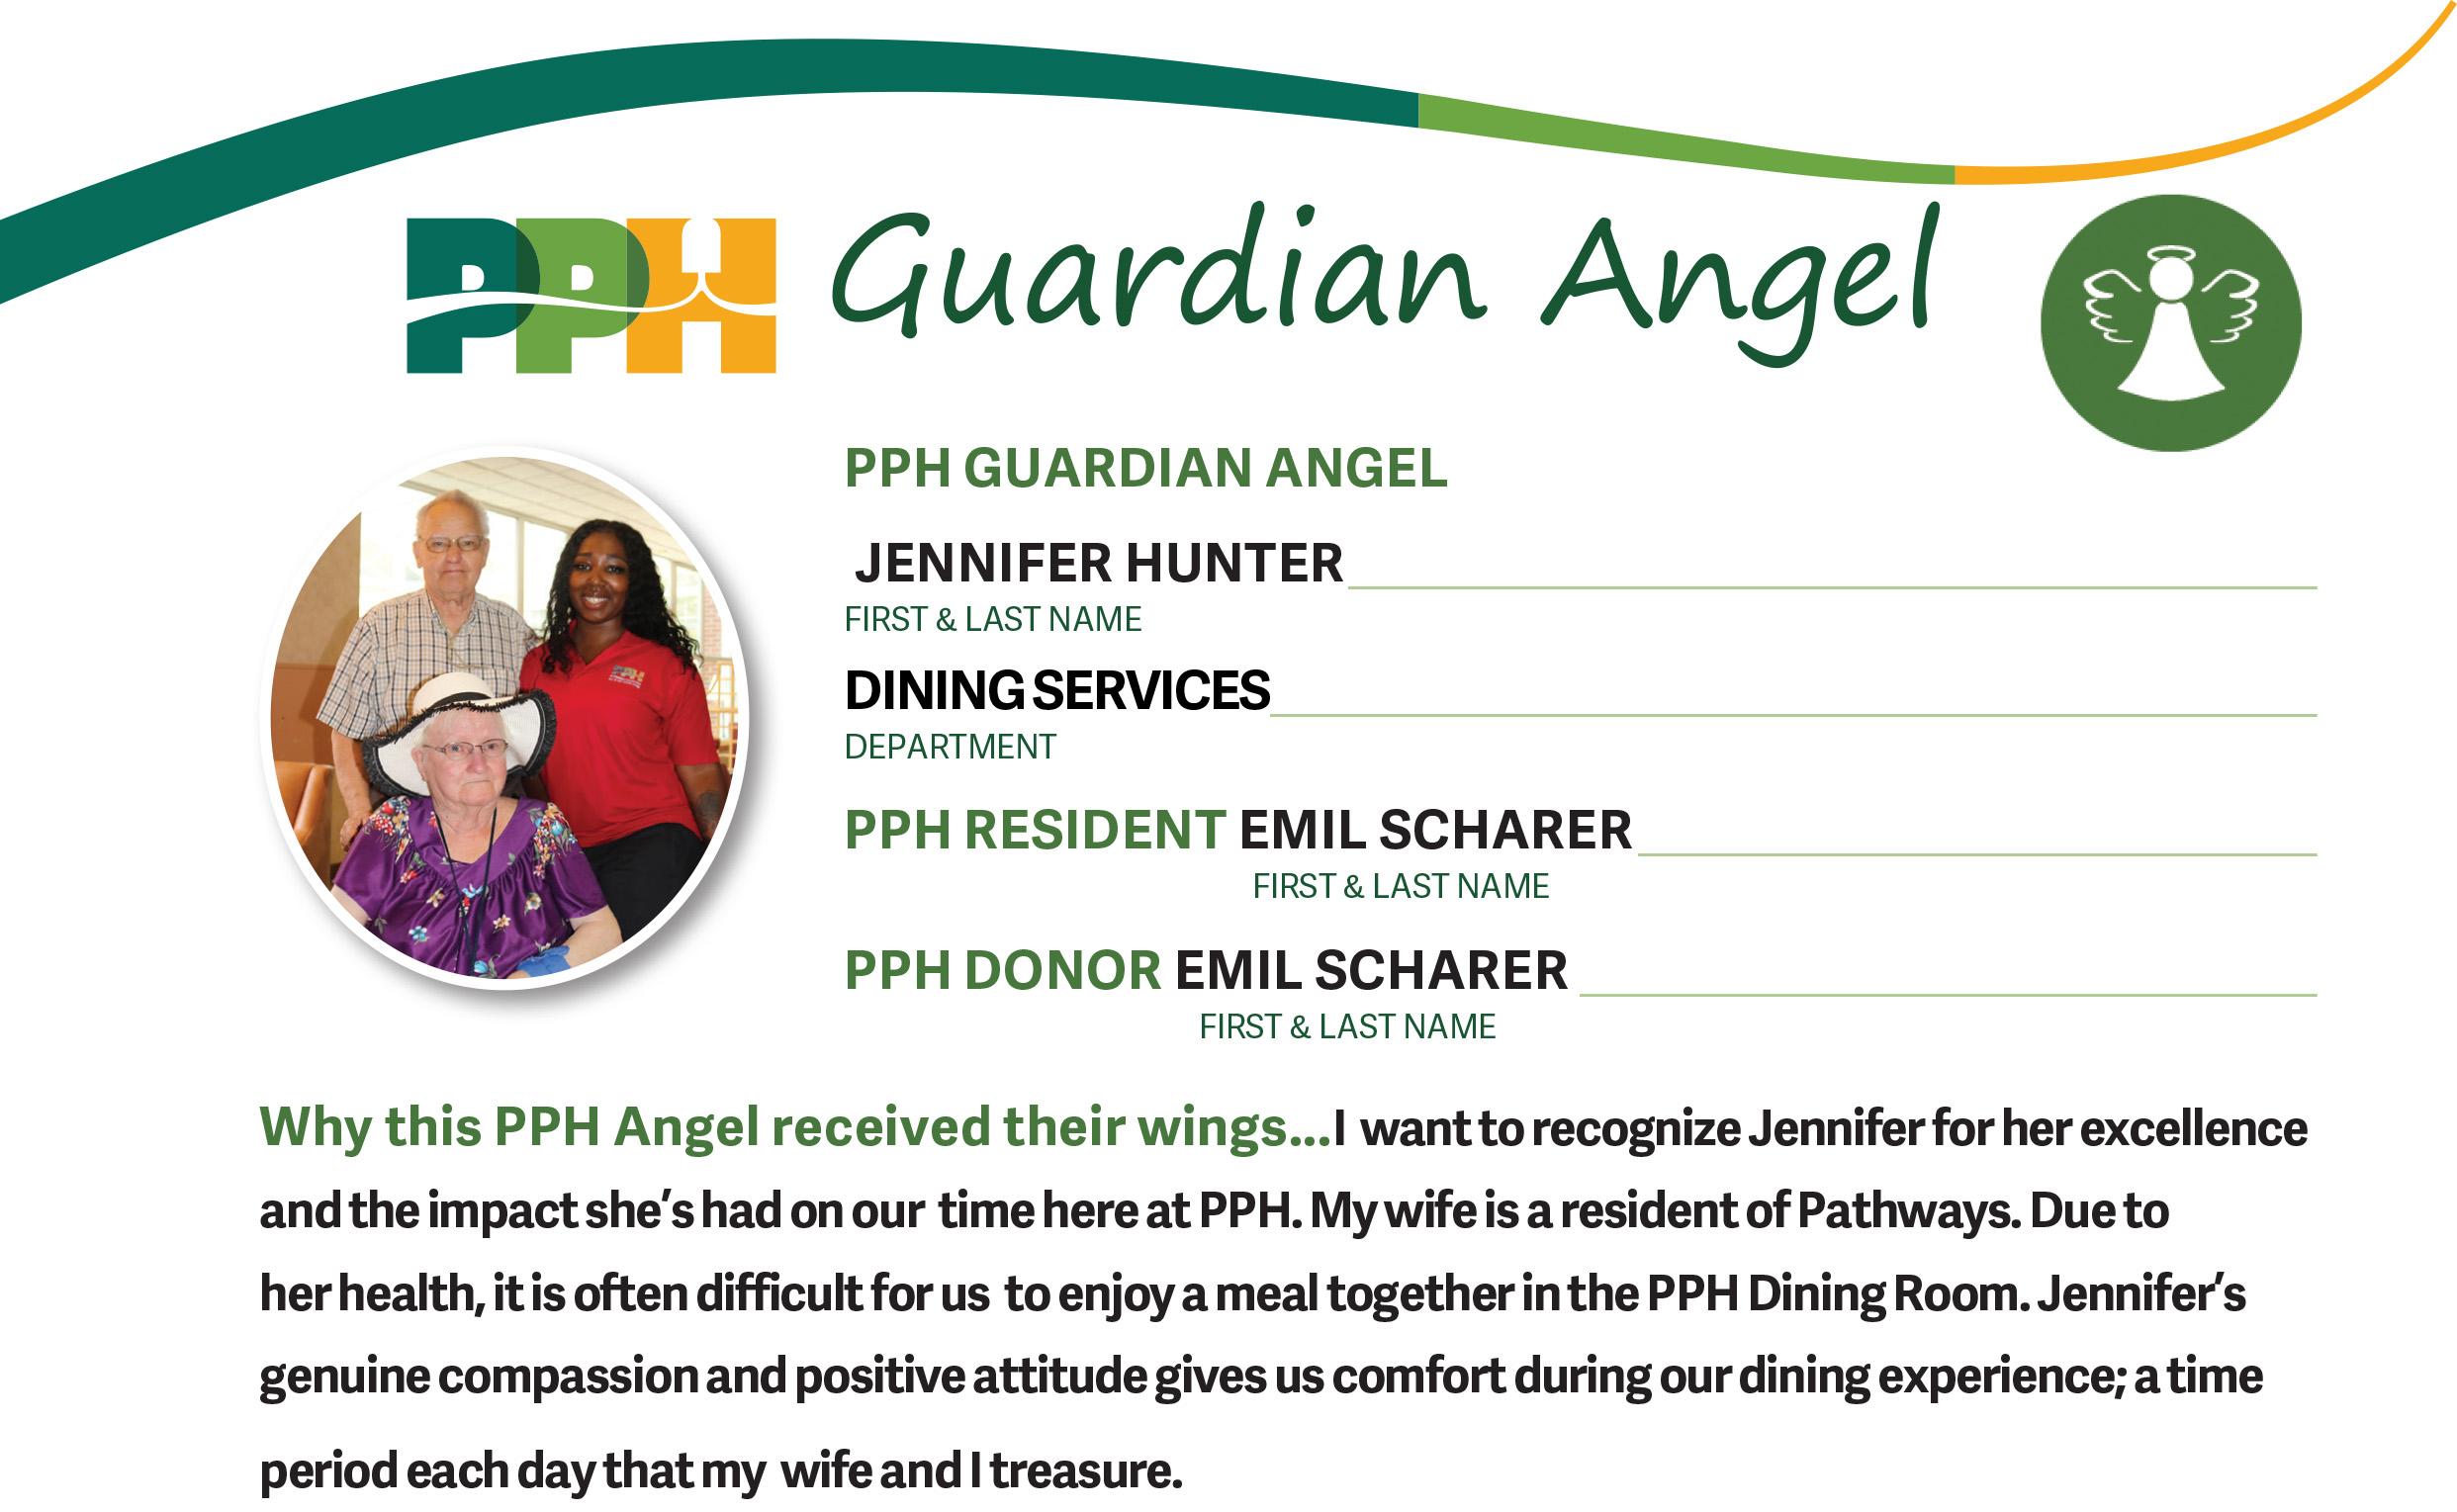 Guardian Angel Giving - Philadelphia Protestant Home